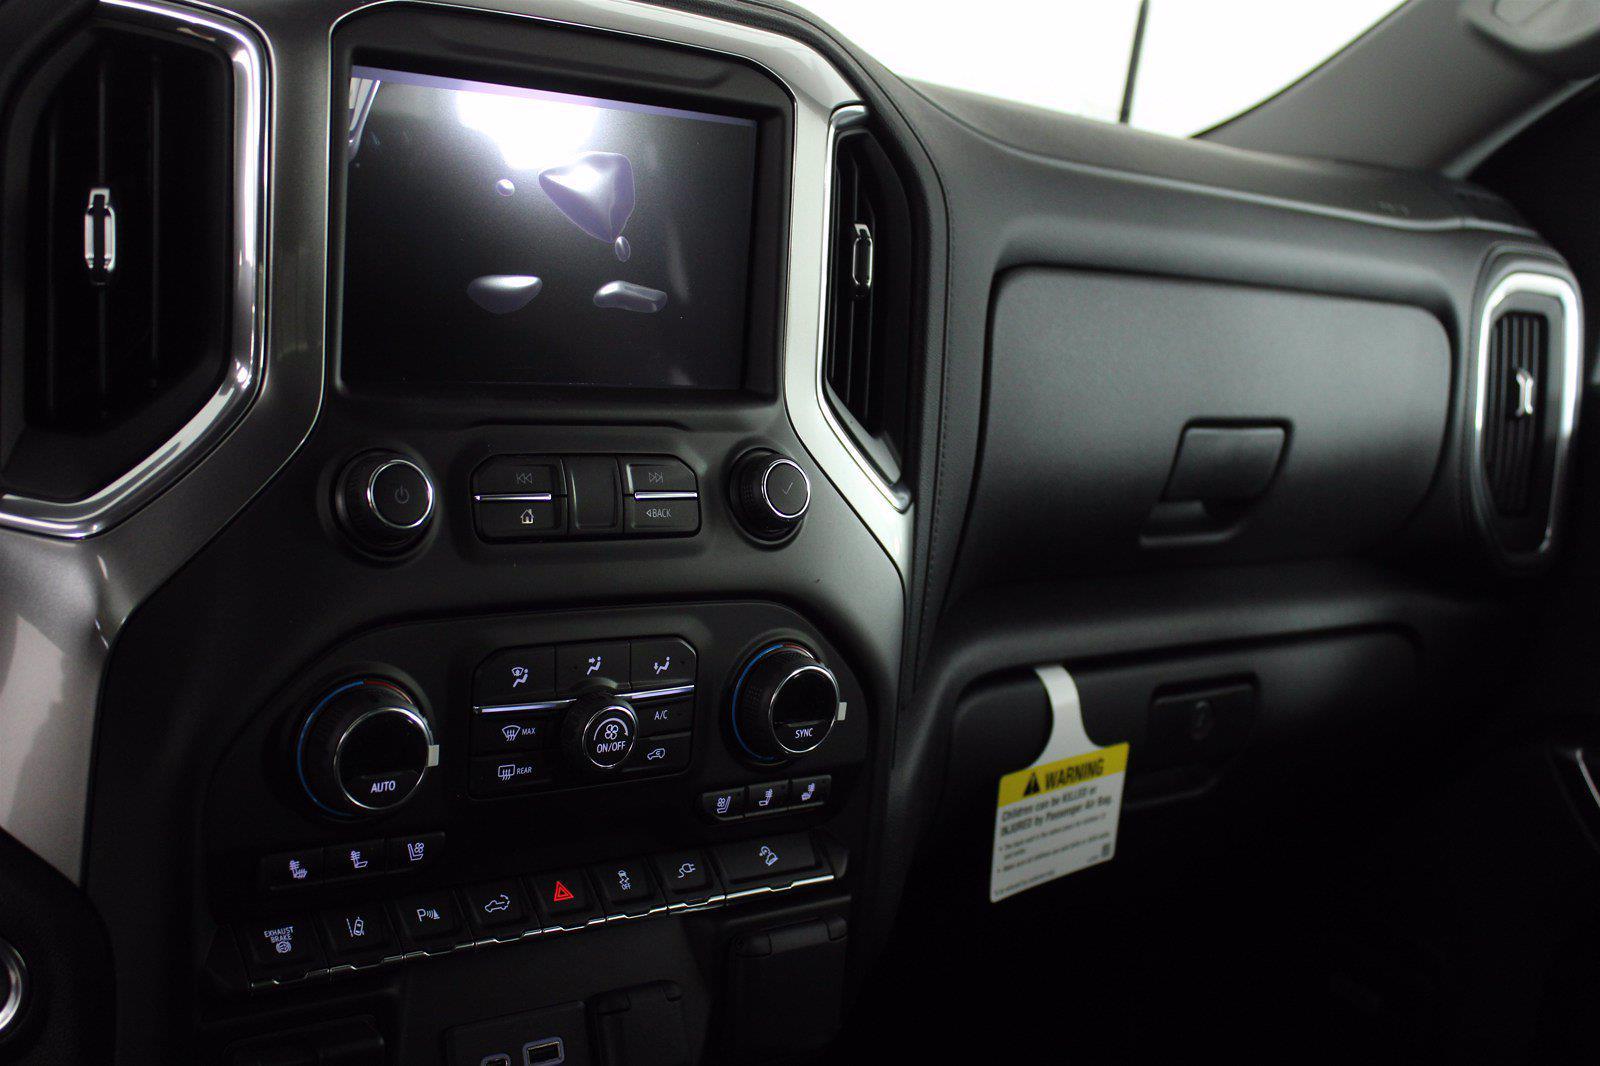 2021 Chevrolet Silverado 2500 Crew Cab 4x4, Pickup #D110744 - photo 12